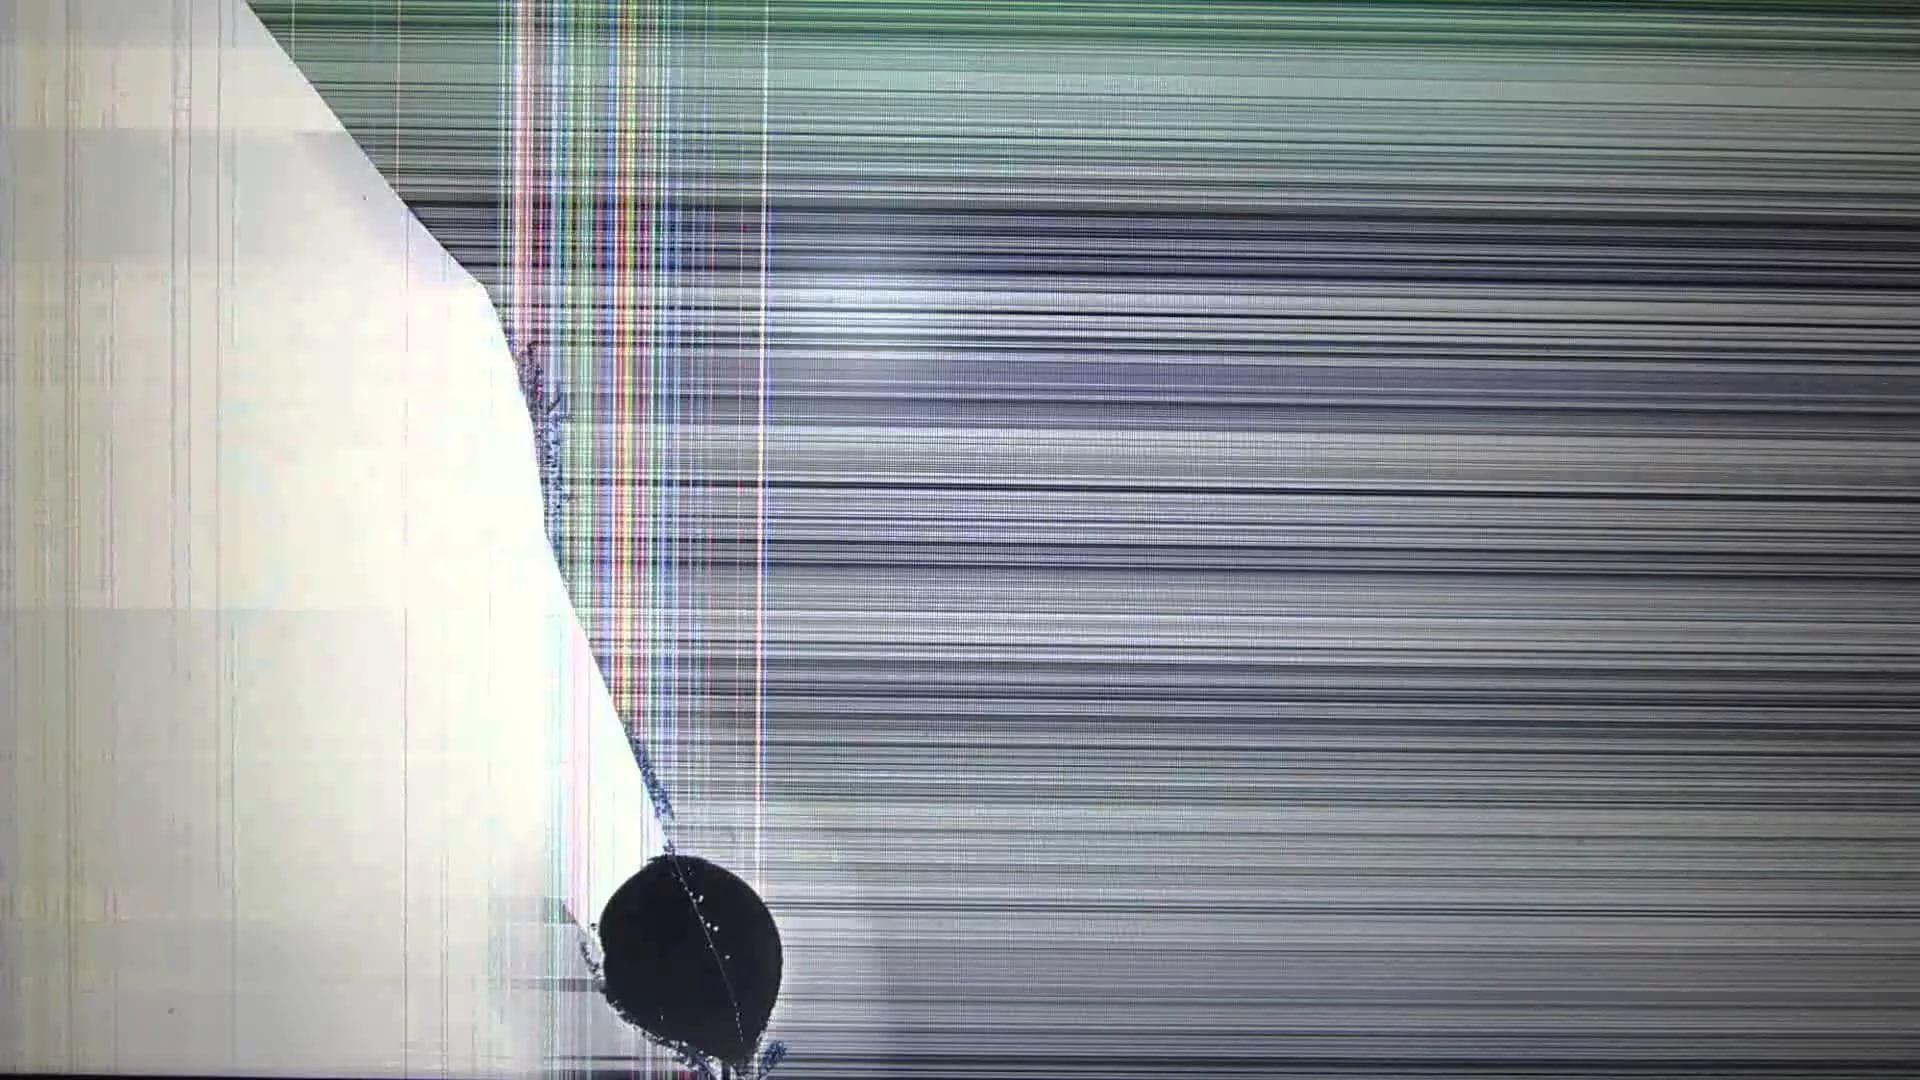 Broken Screen Good Wallpaper